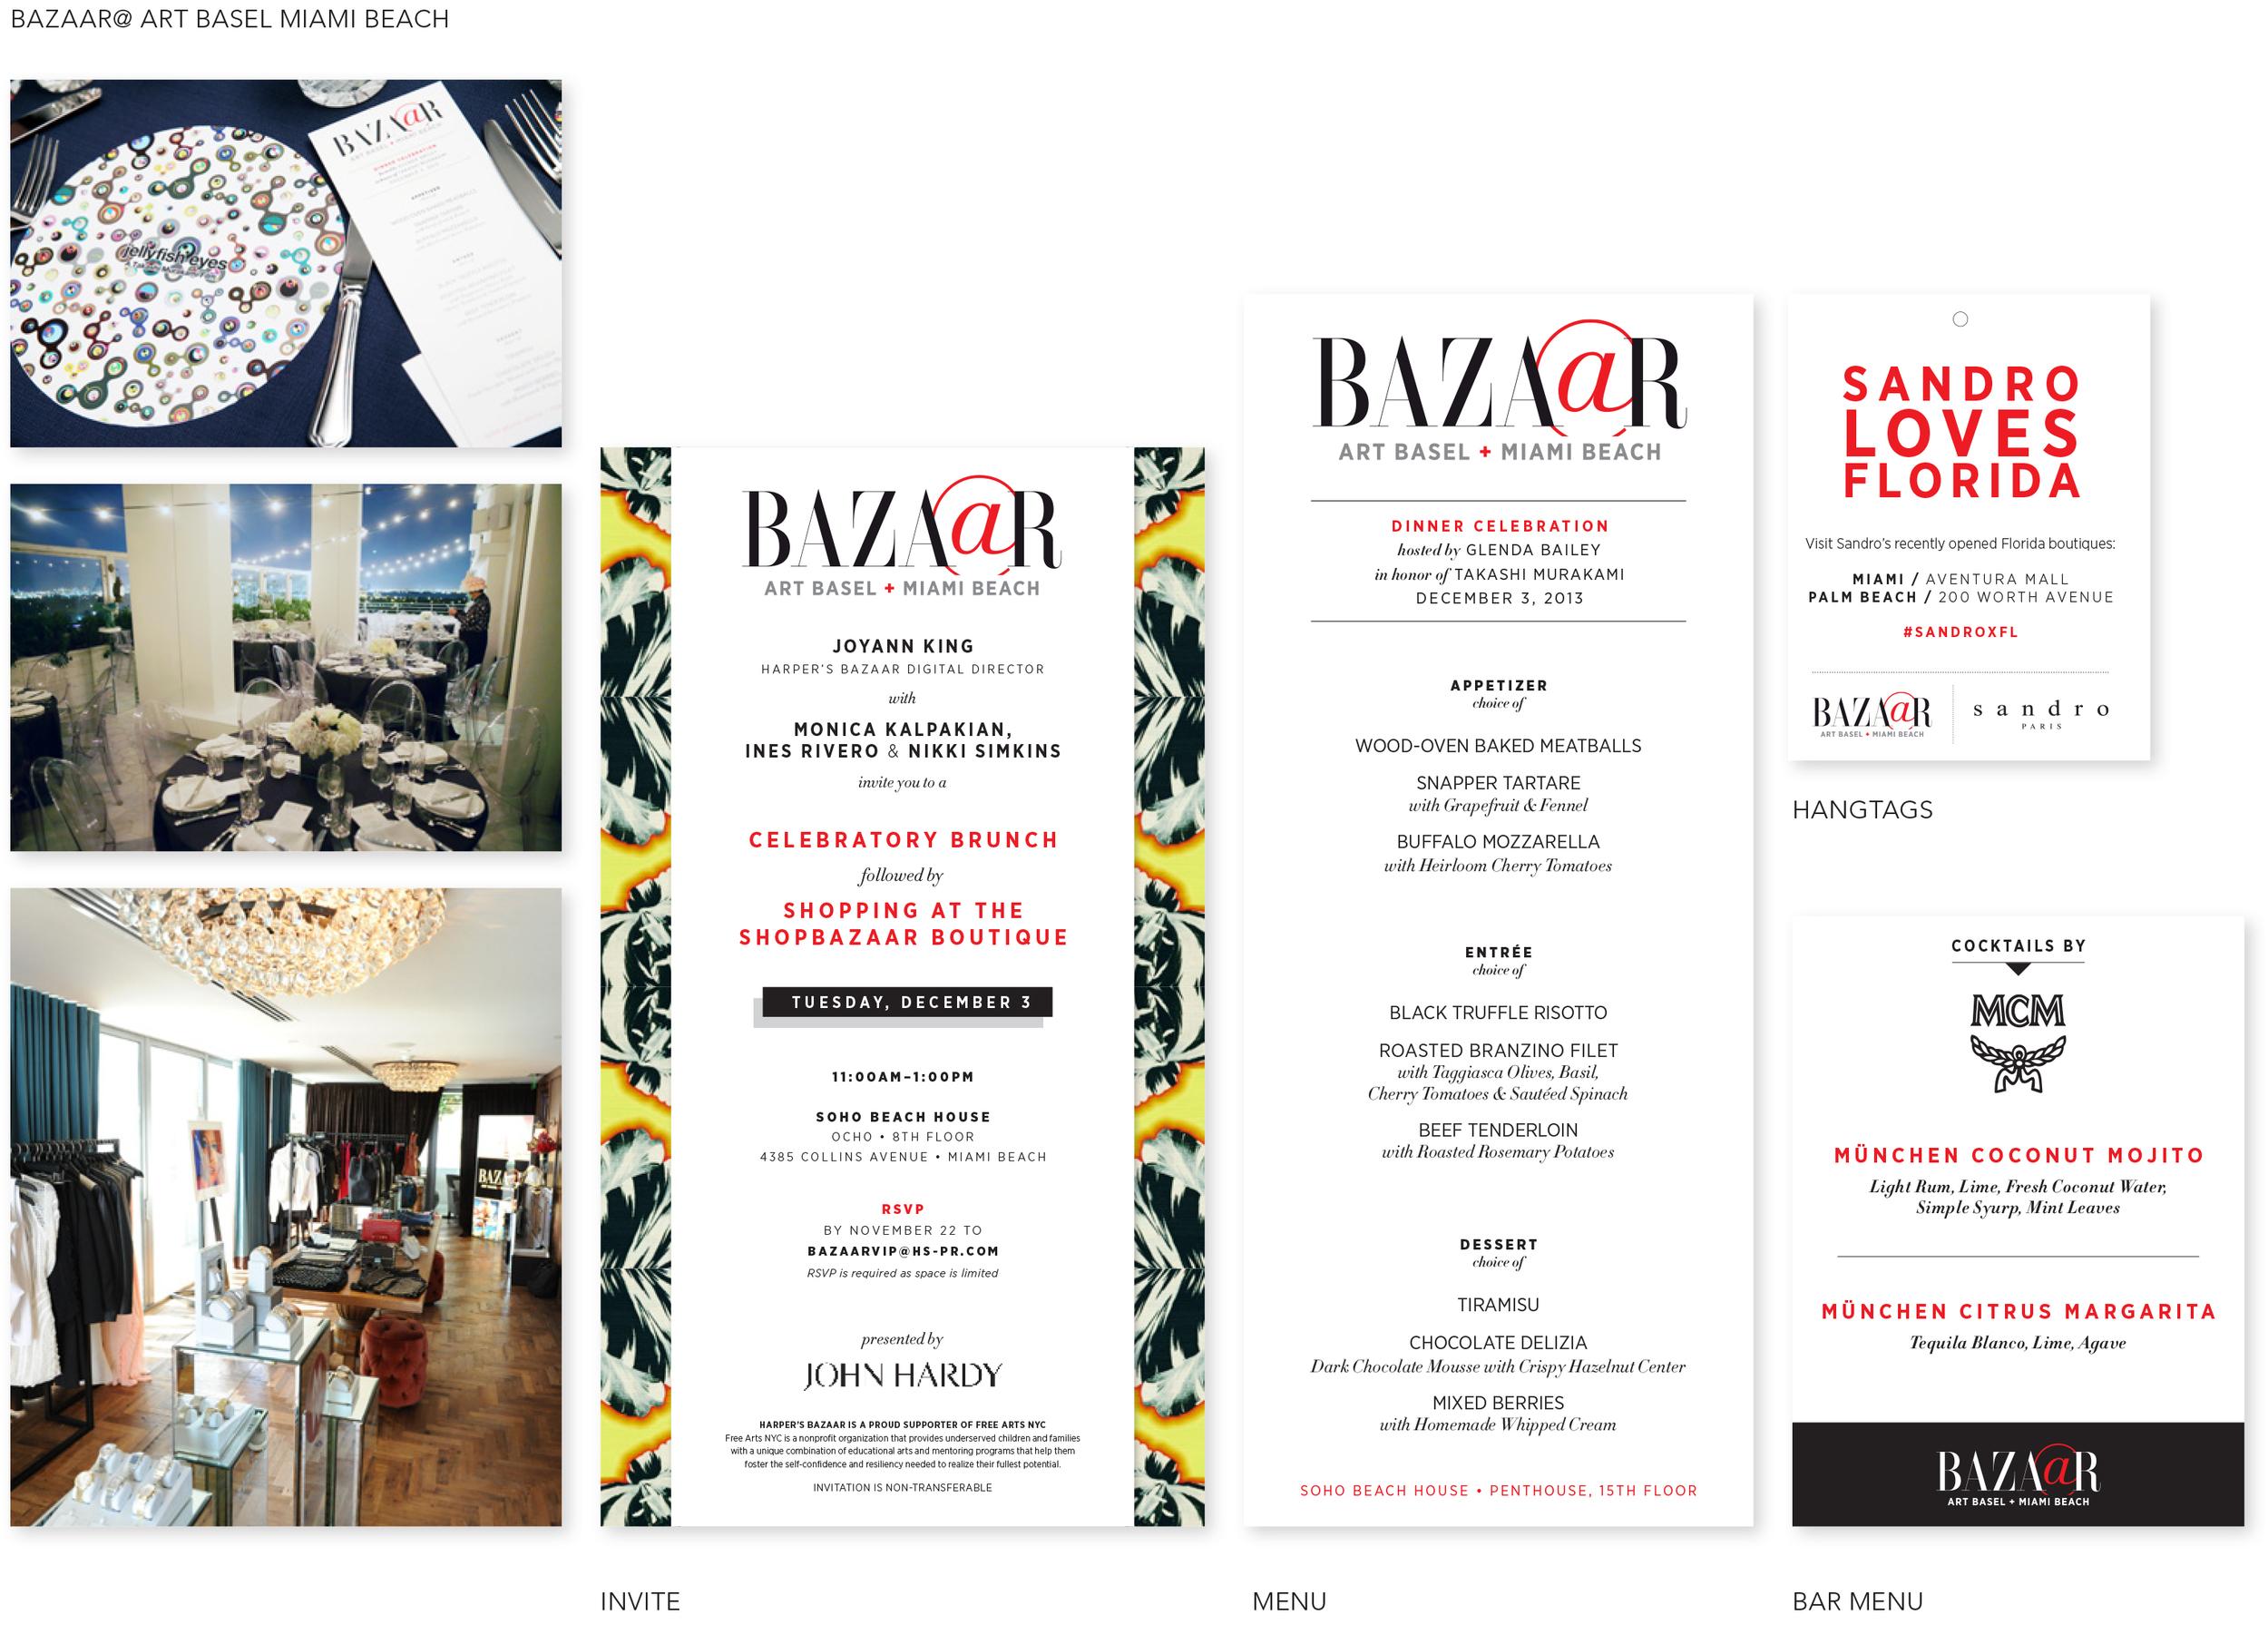 BAZAAR at Art Basel Miami